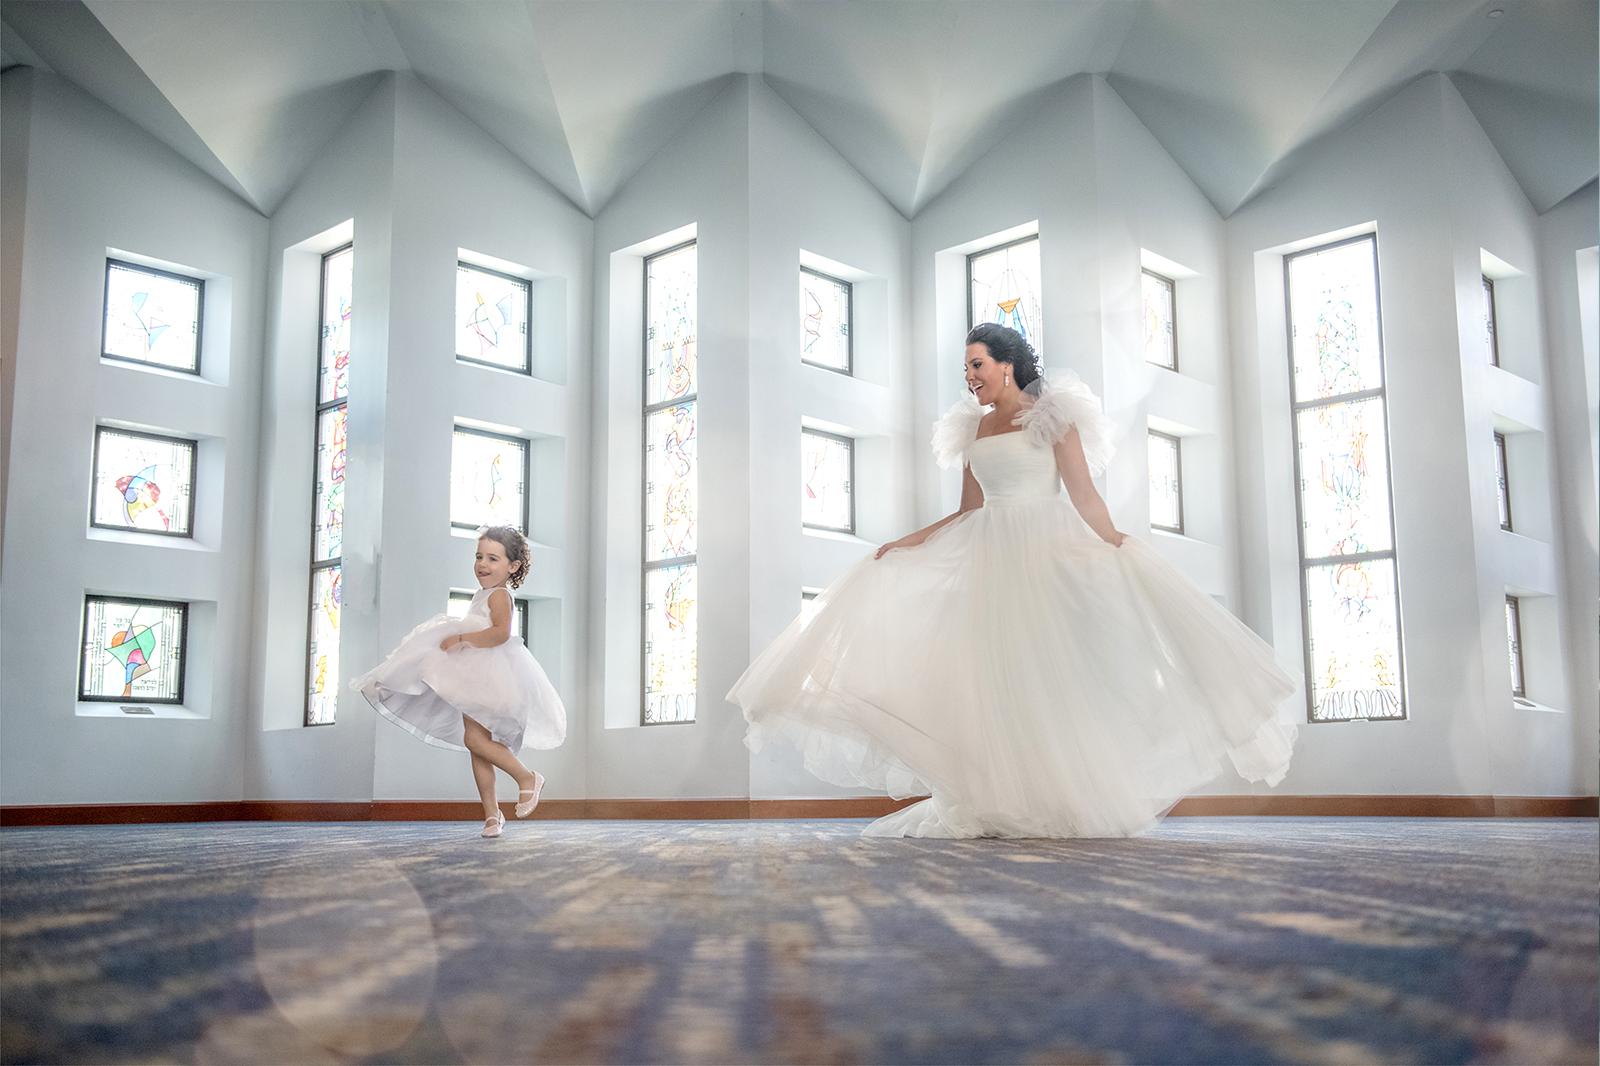 Bride and flower girl swirling